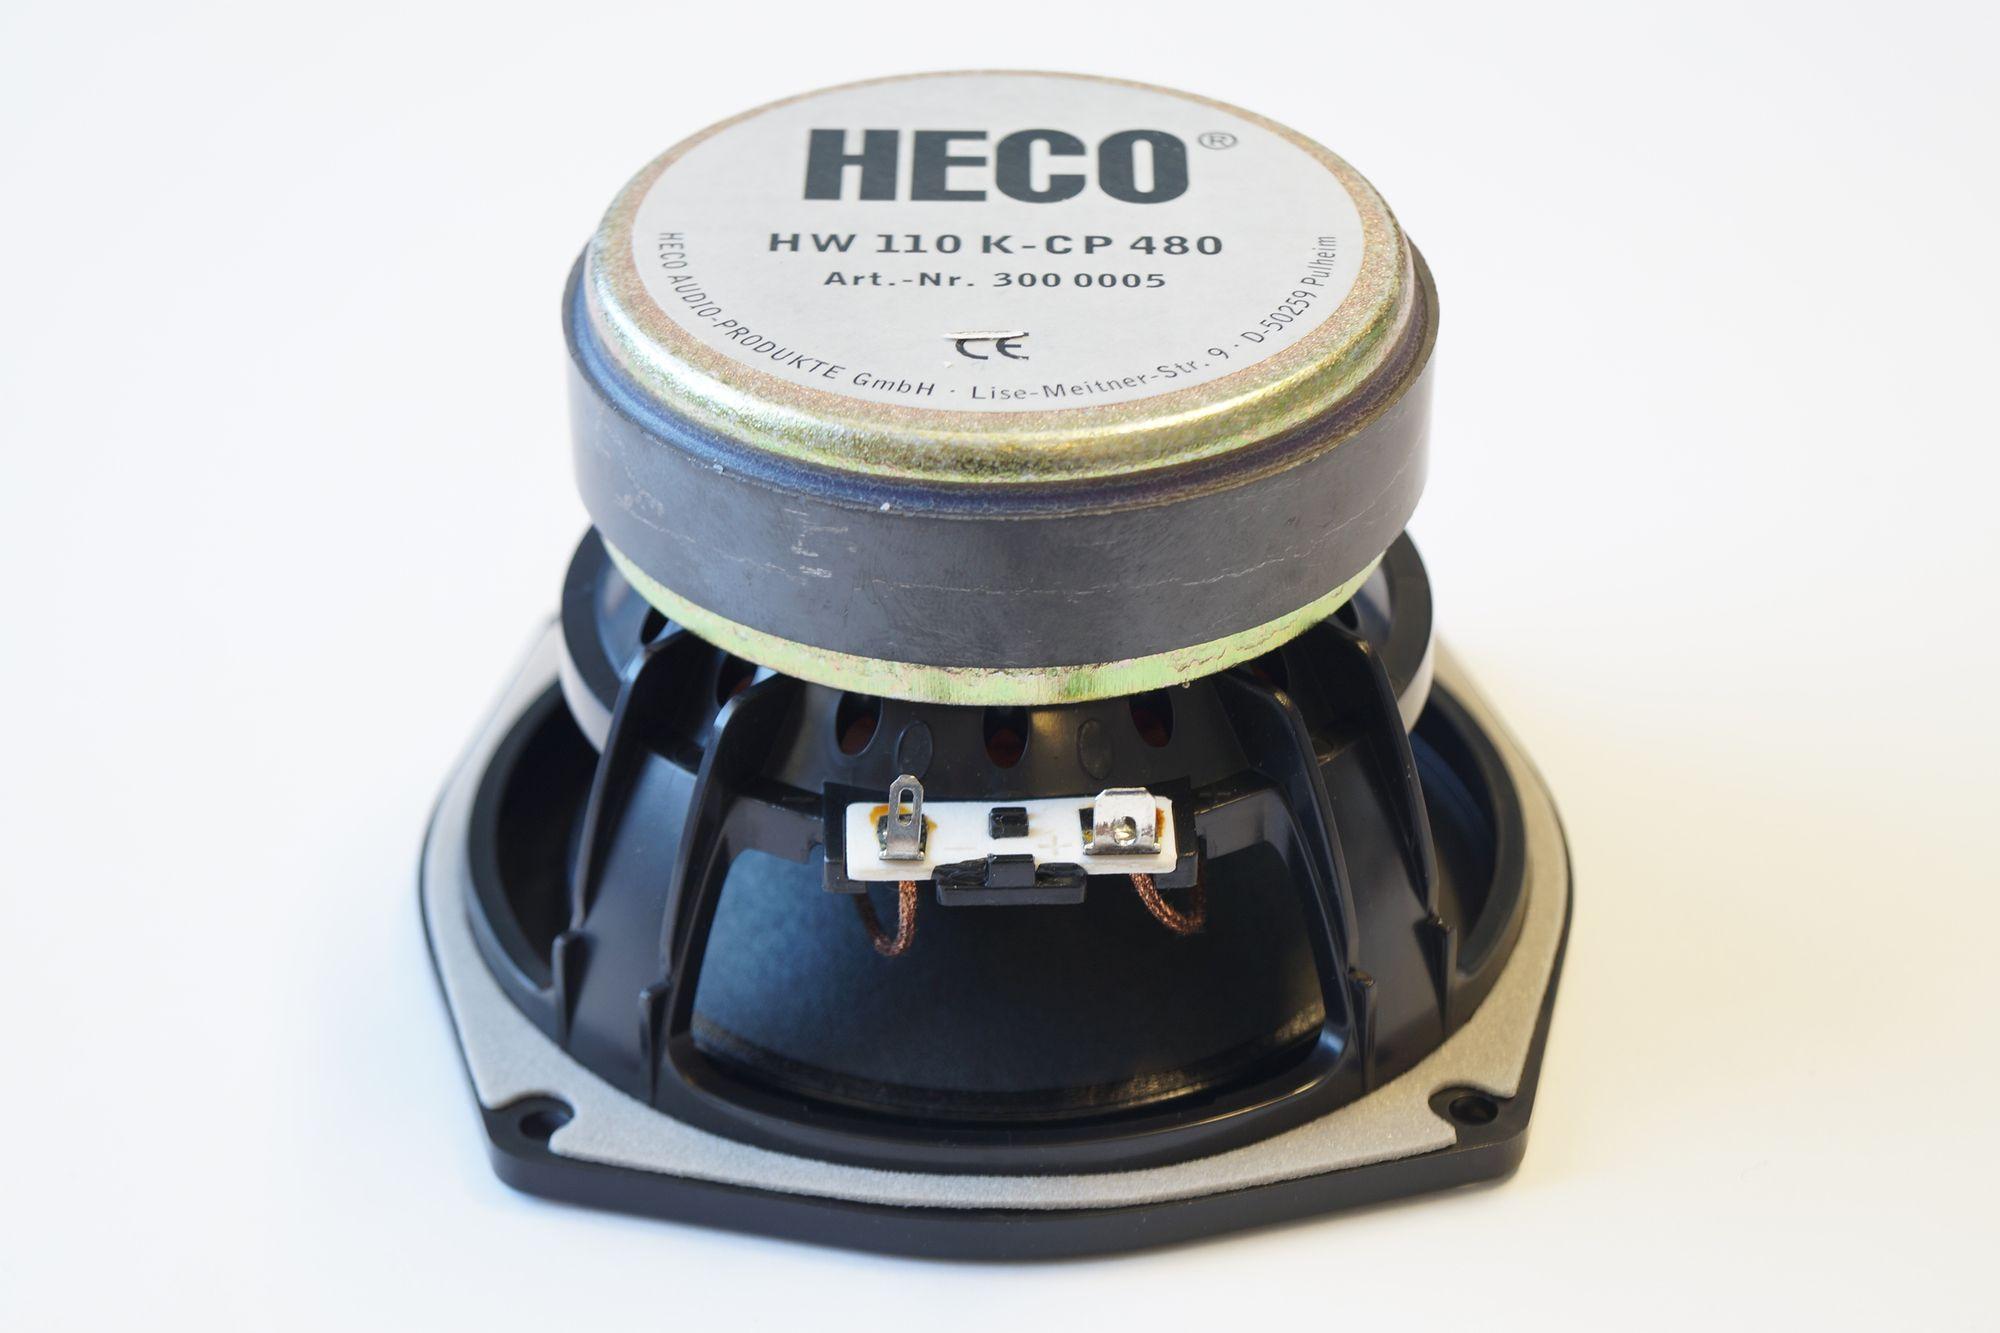 1 Stück Heco 110 mm Tiefmitteltöner HW110 K-CP 480 , Serviceware – Bild 2